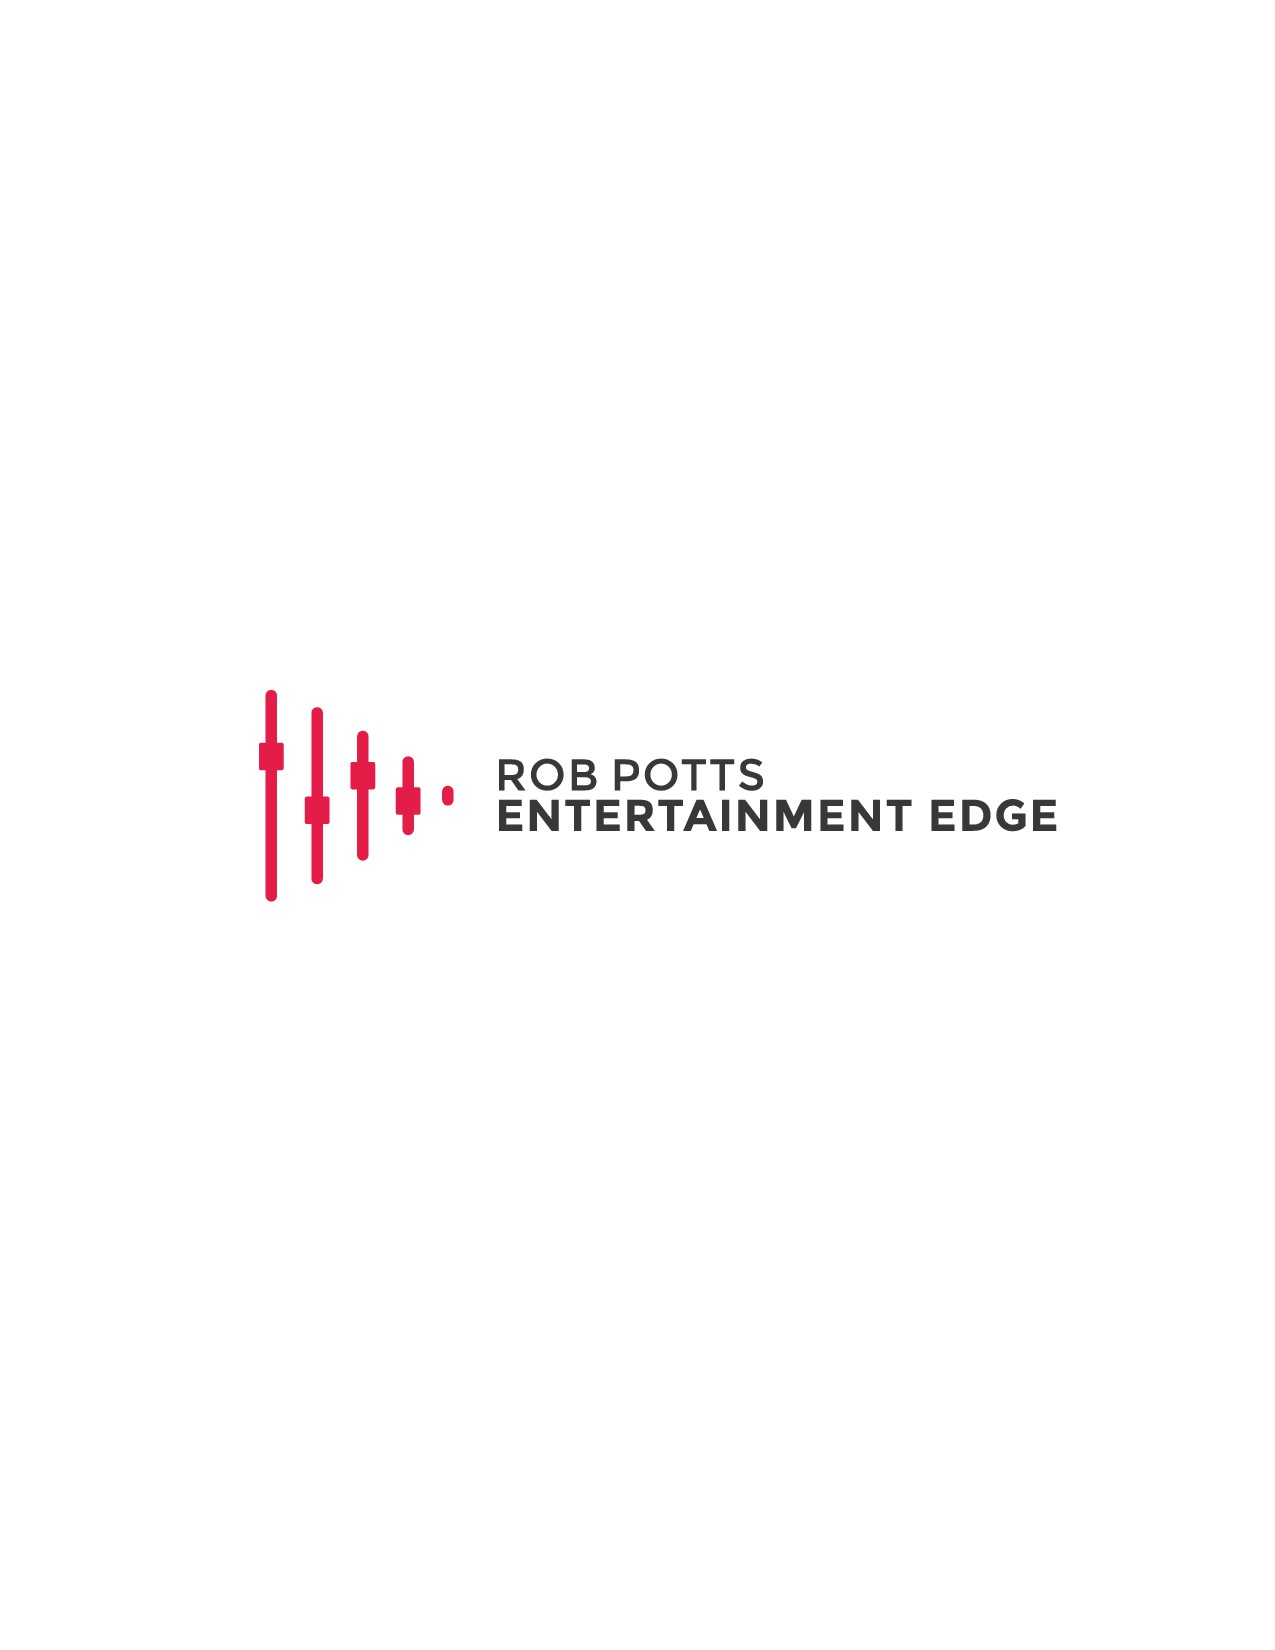 Create the new logo for a top Australian music company